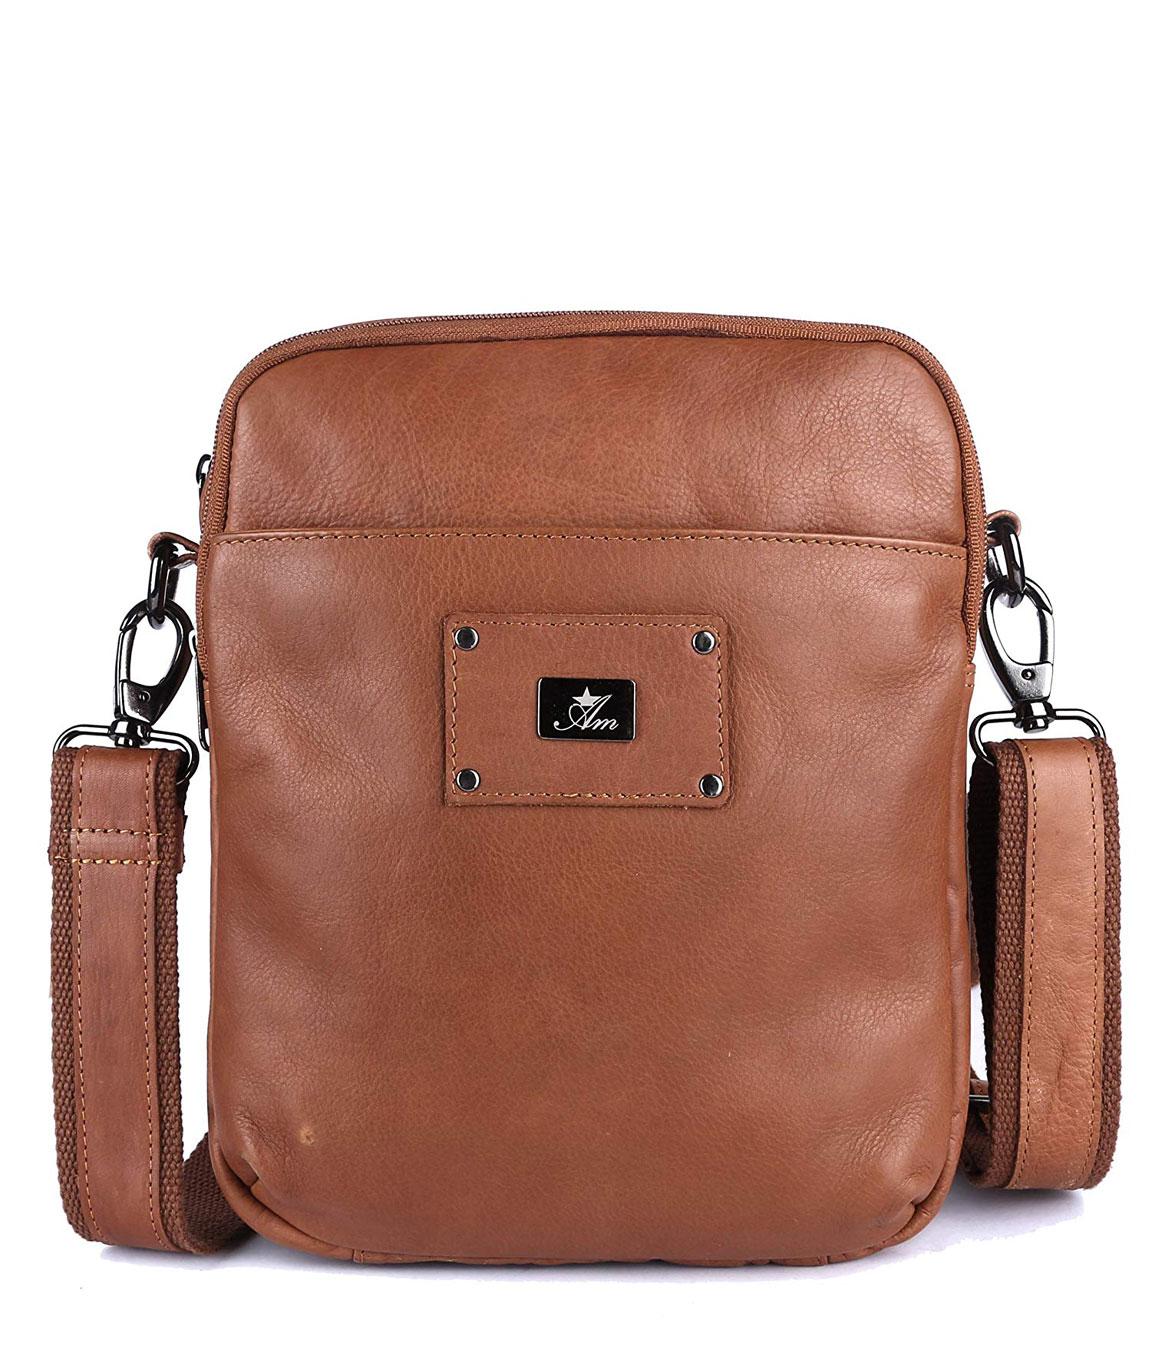 Am Leather Handmade LEEMBRUIN Colour Leather Messenger Bag Shoulder Bag for Men and Women